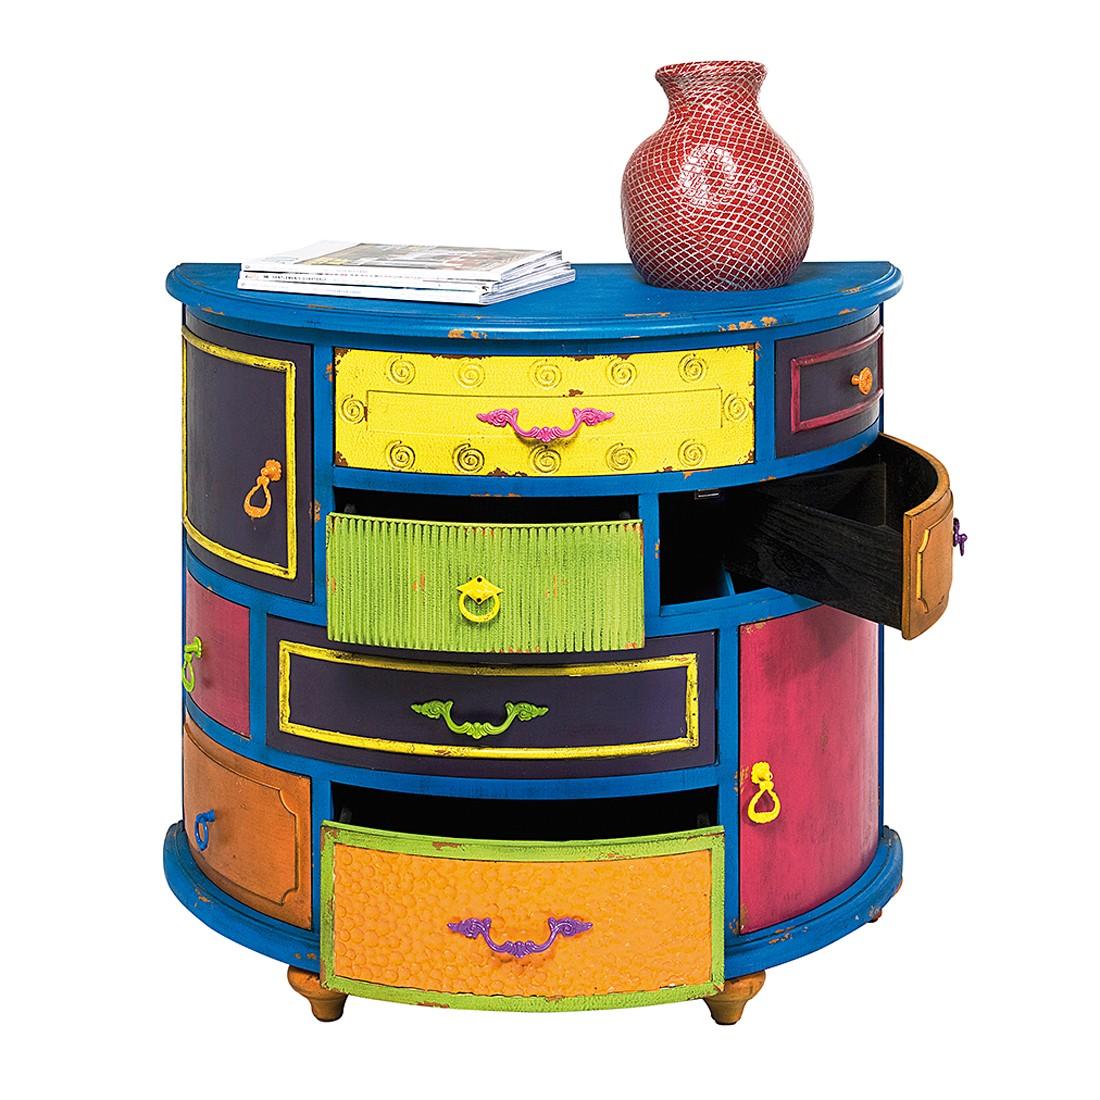 Kommoden Kare Design : ... hier: Home Schlafzimmer Kommoden Kare Design Kommode Gitano Halbrund